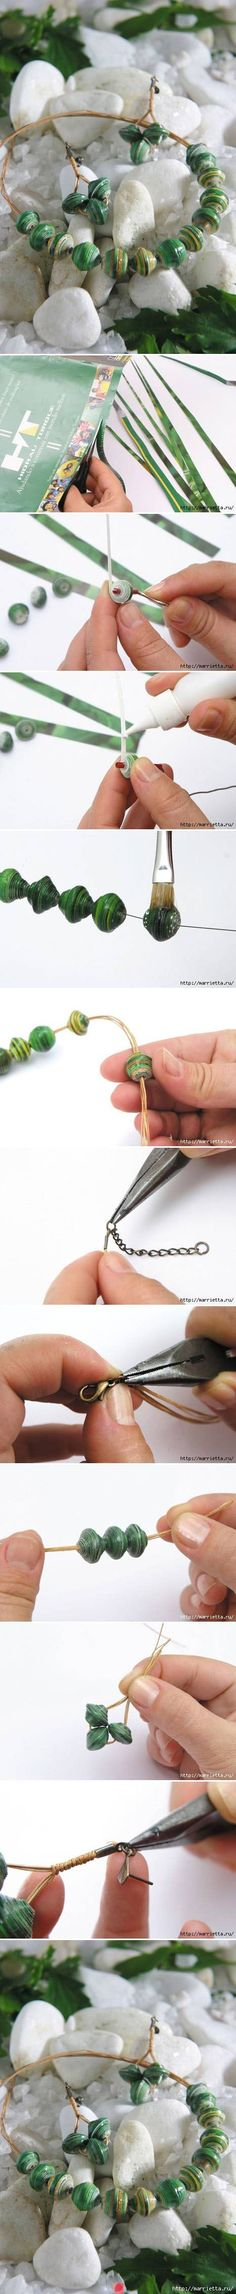 13 Simple Ways to Have DIY Accessories